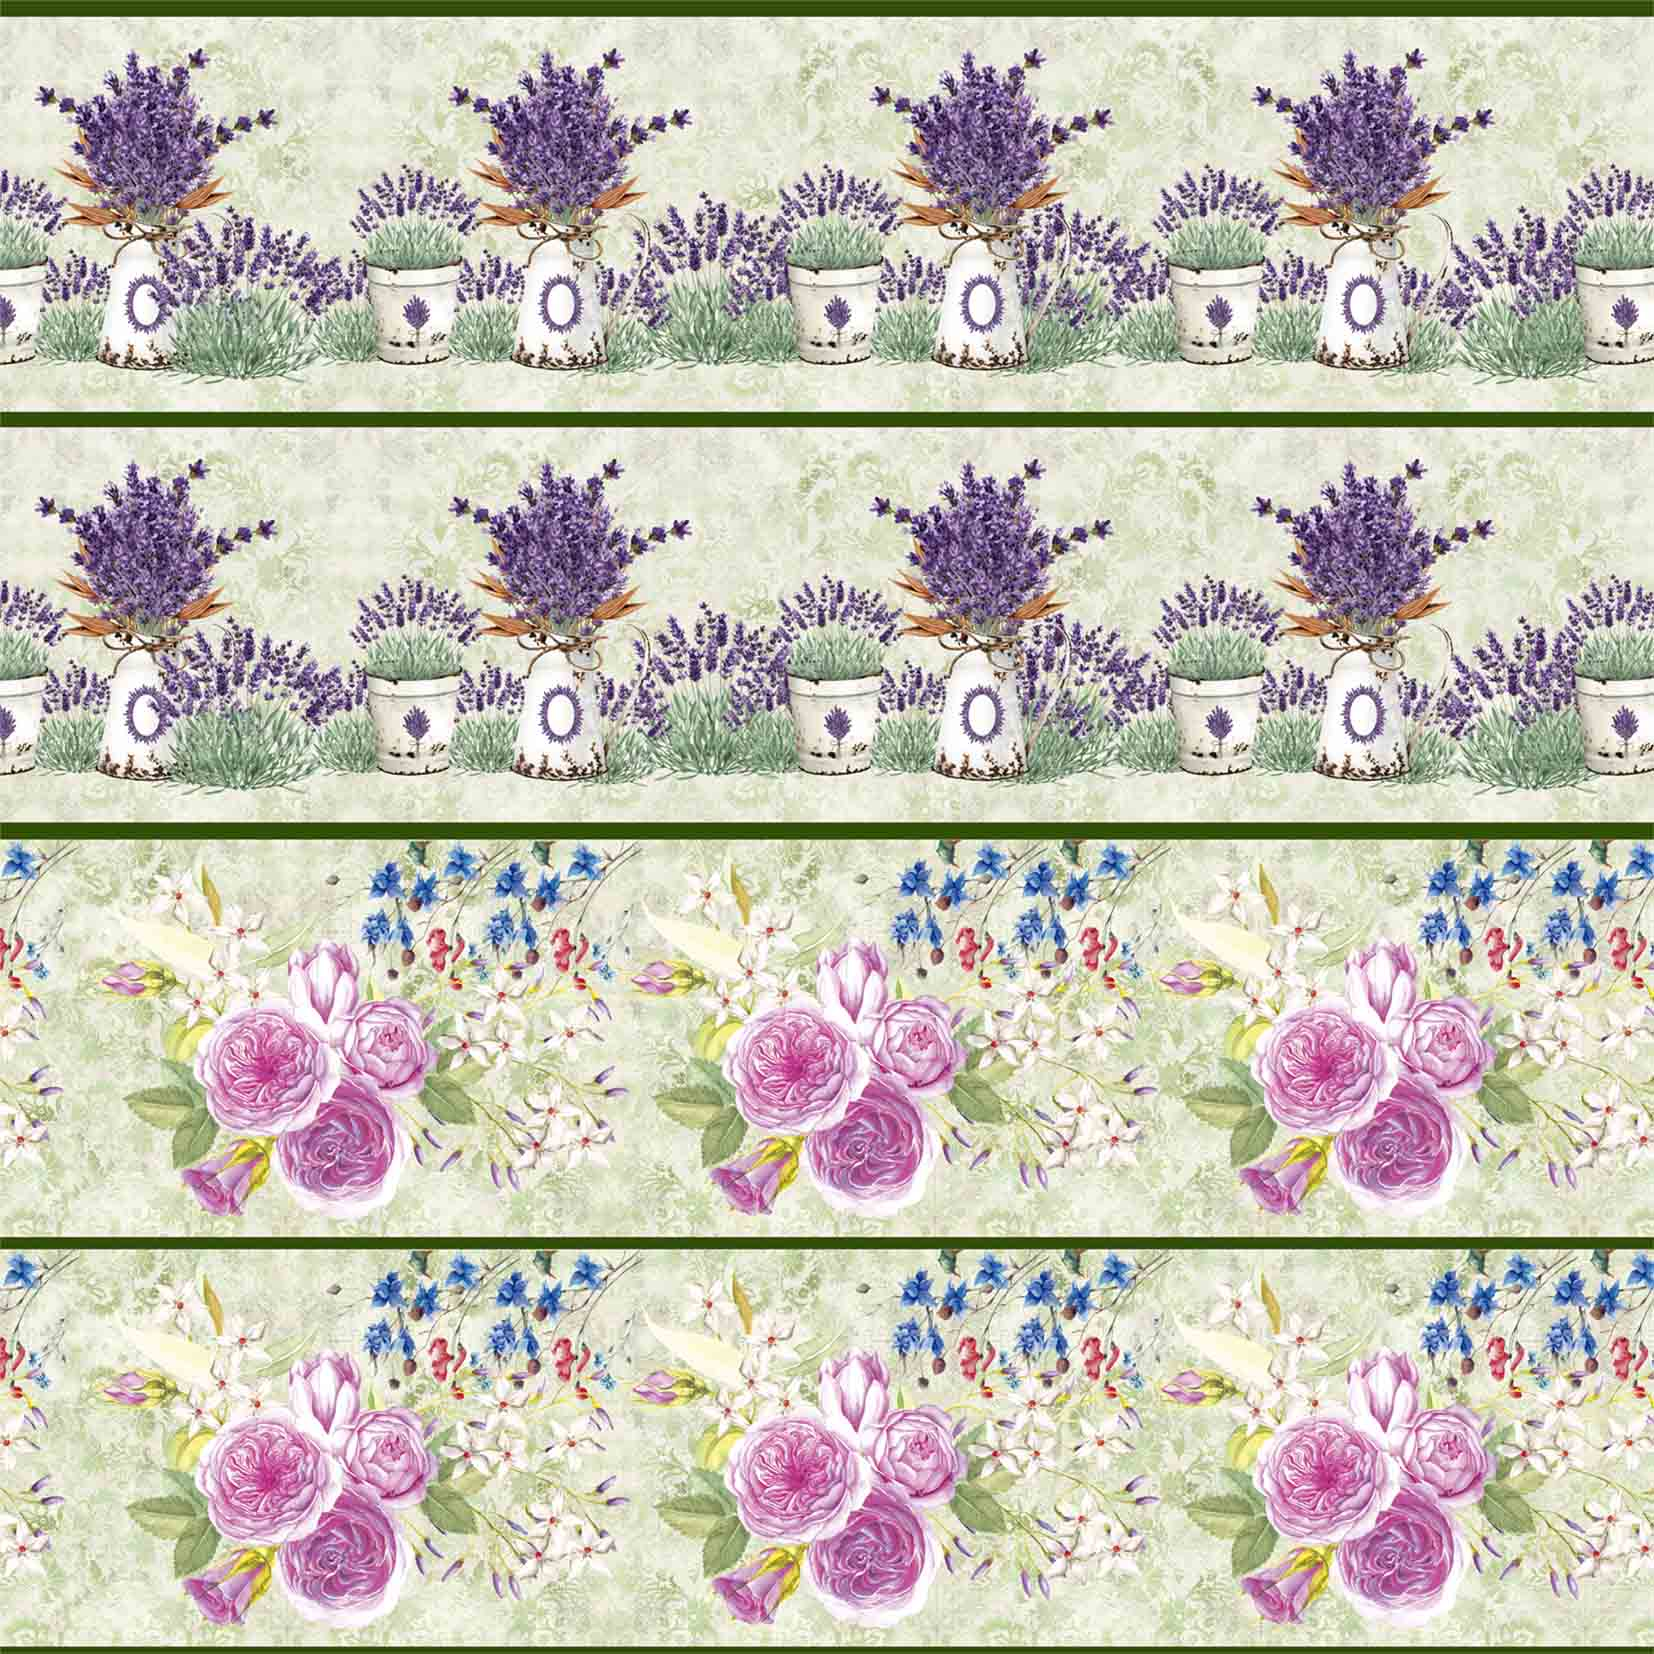 Faixa Floral III - Lavanda